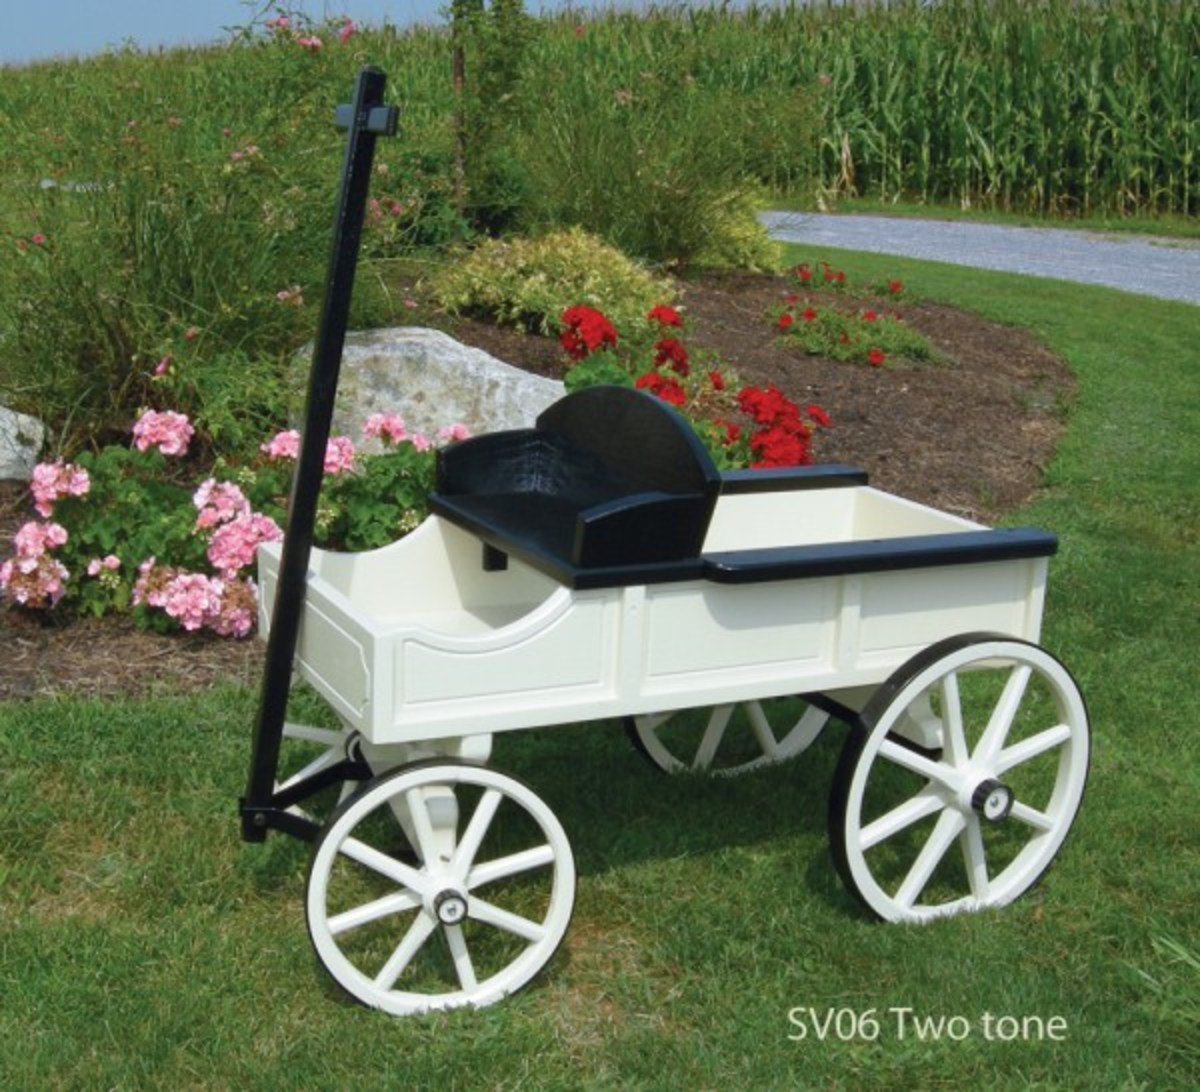 buckboard-wagons-you-can-still-purchase-an-amish-full-size-or-scaled-version-buckboard-wagon